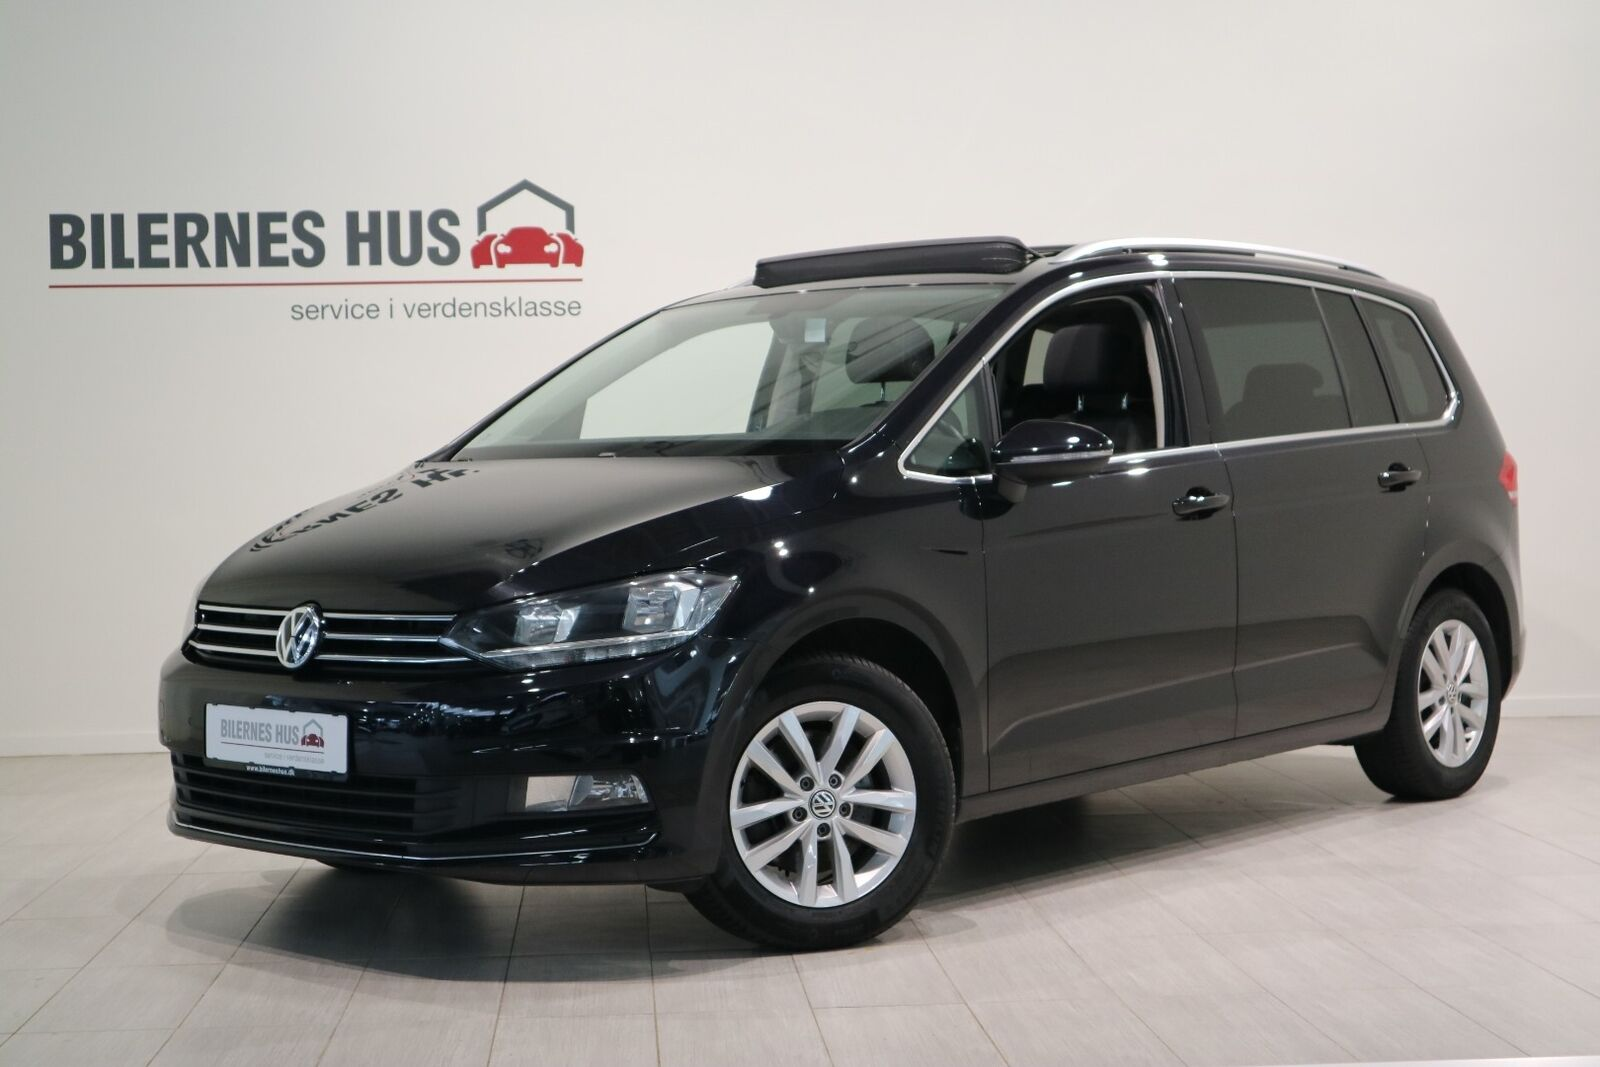 VW Touran 1,6 TDi 110 Highline DSG